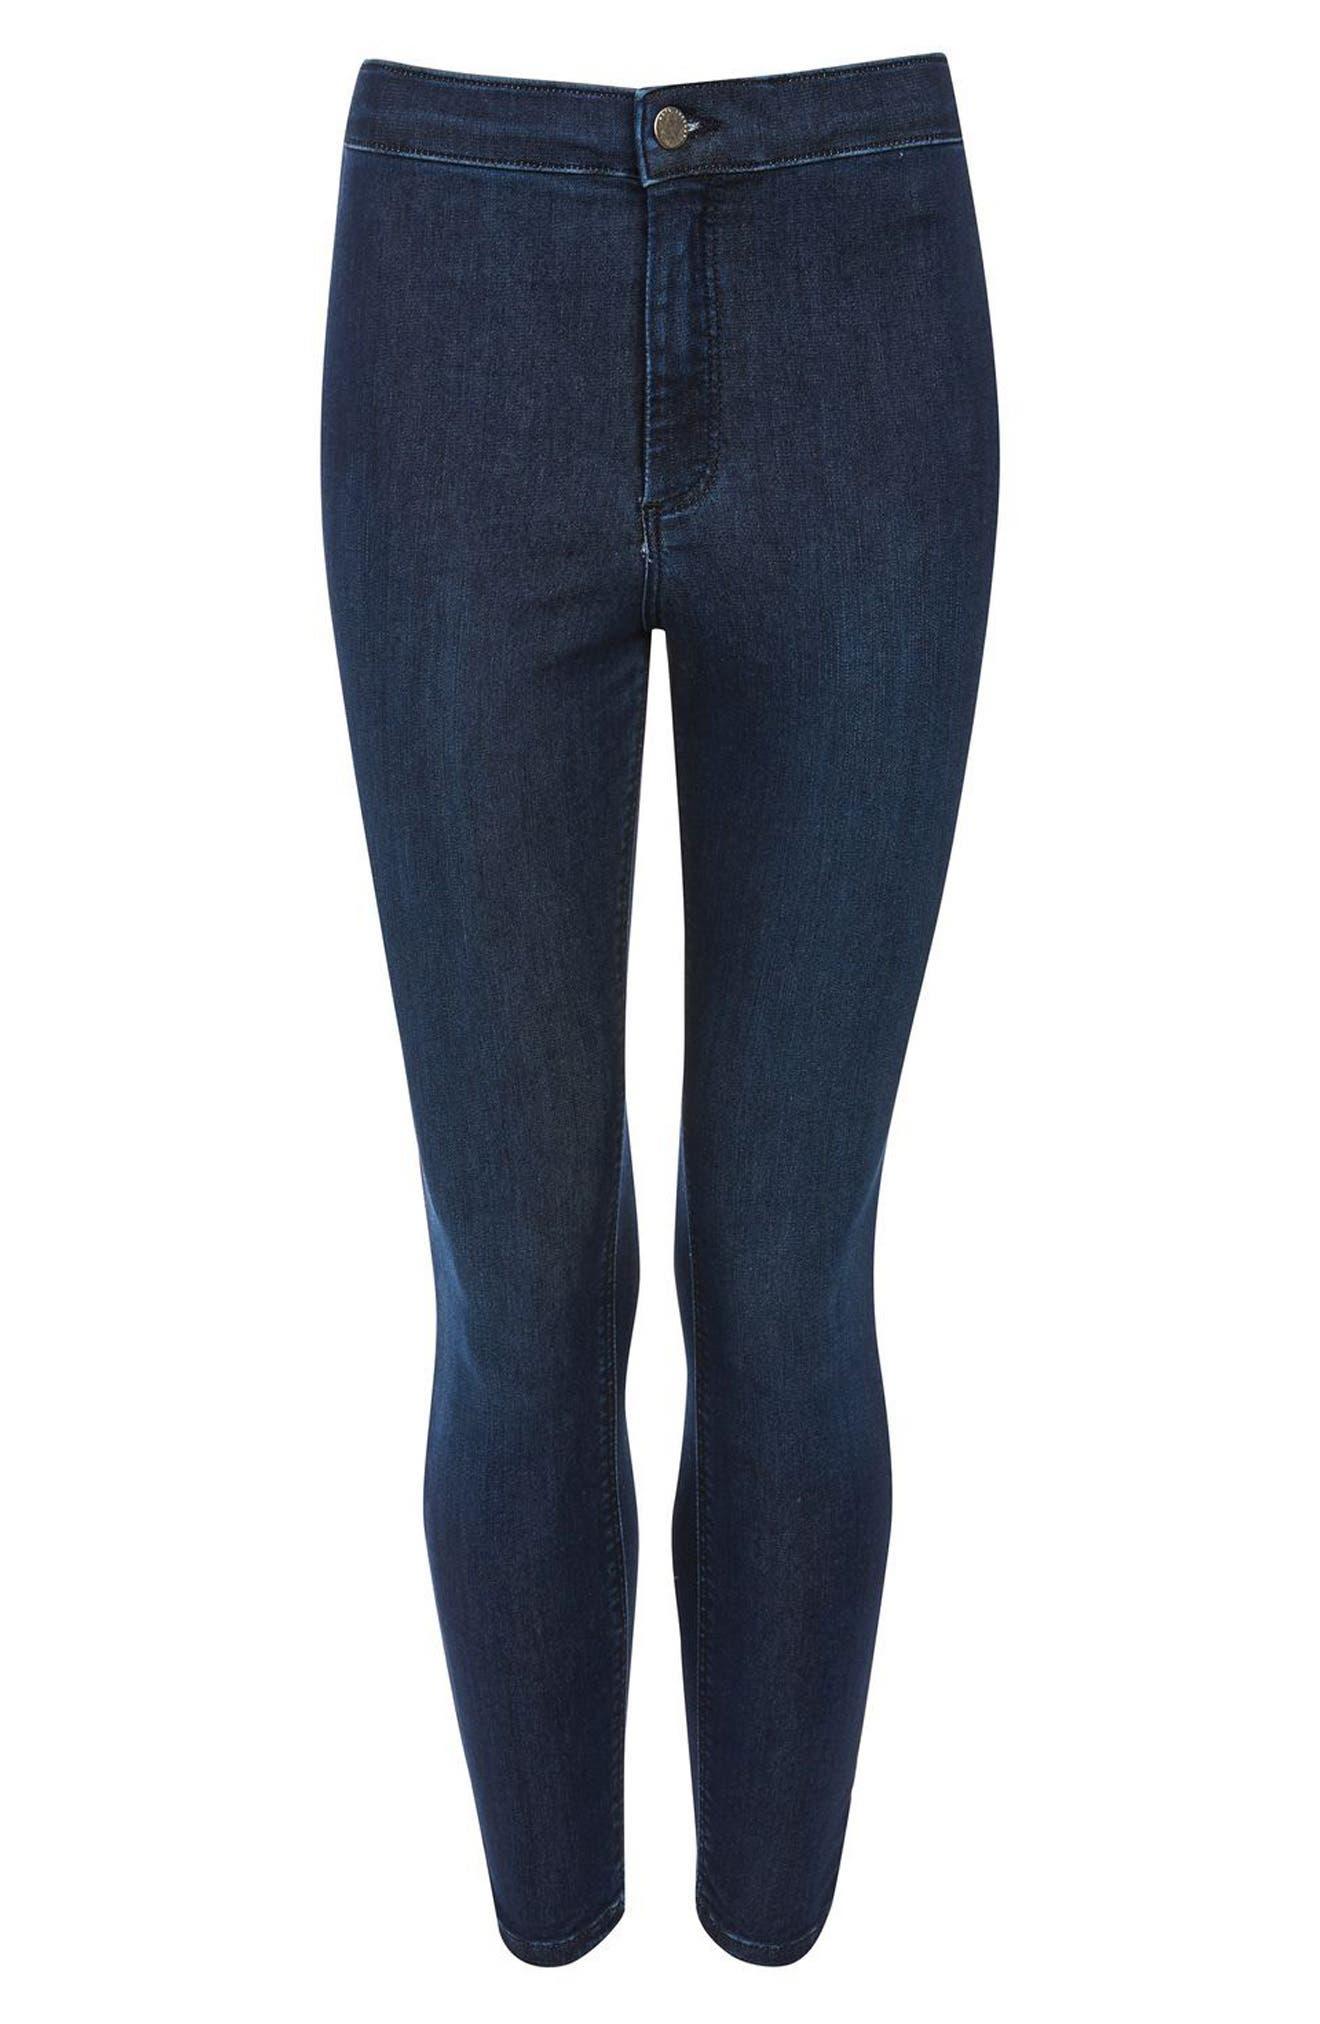 Joni High Waist Skinny Jeans,                             Alternate thumbnail 3, color,                             401